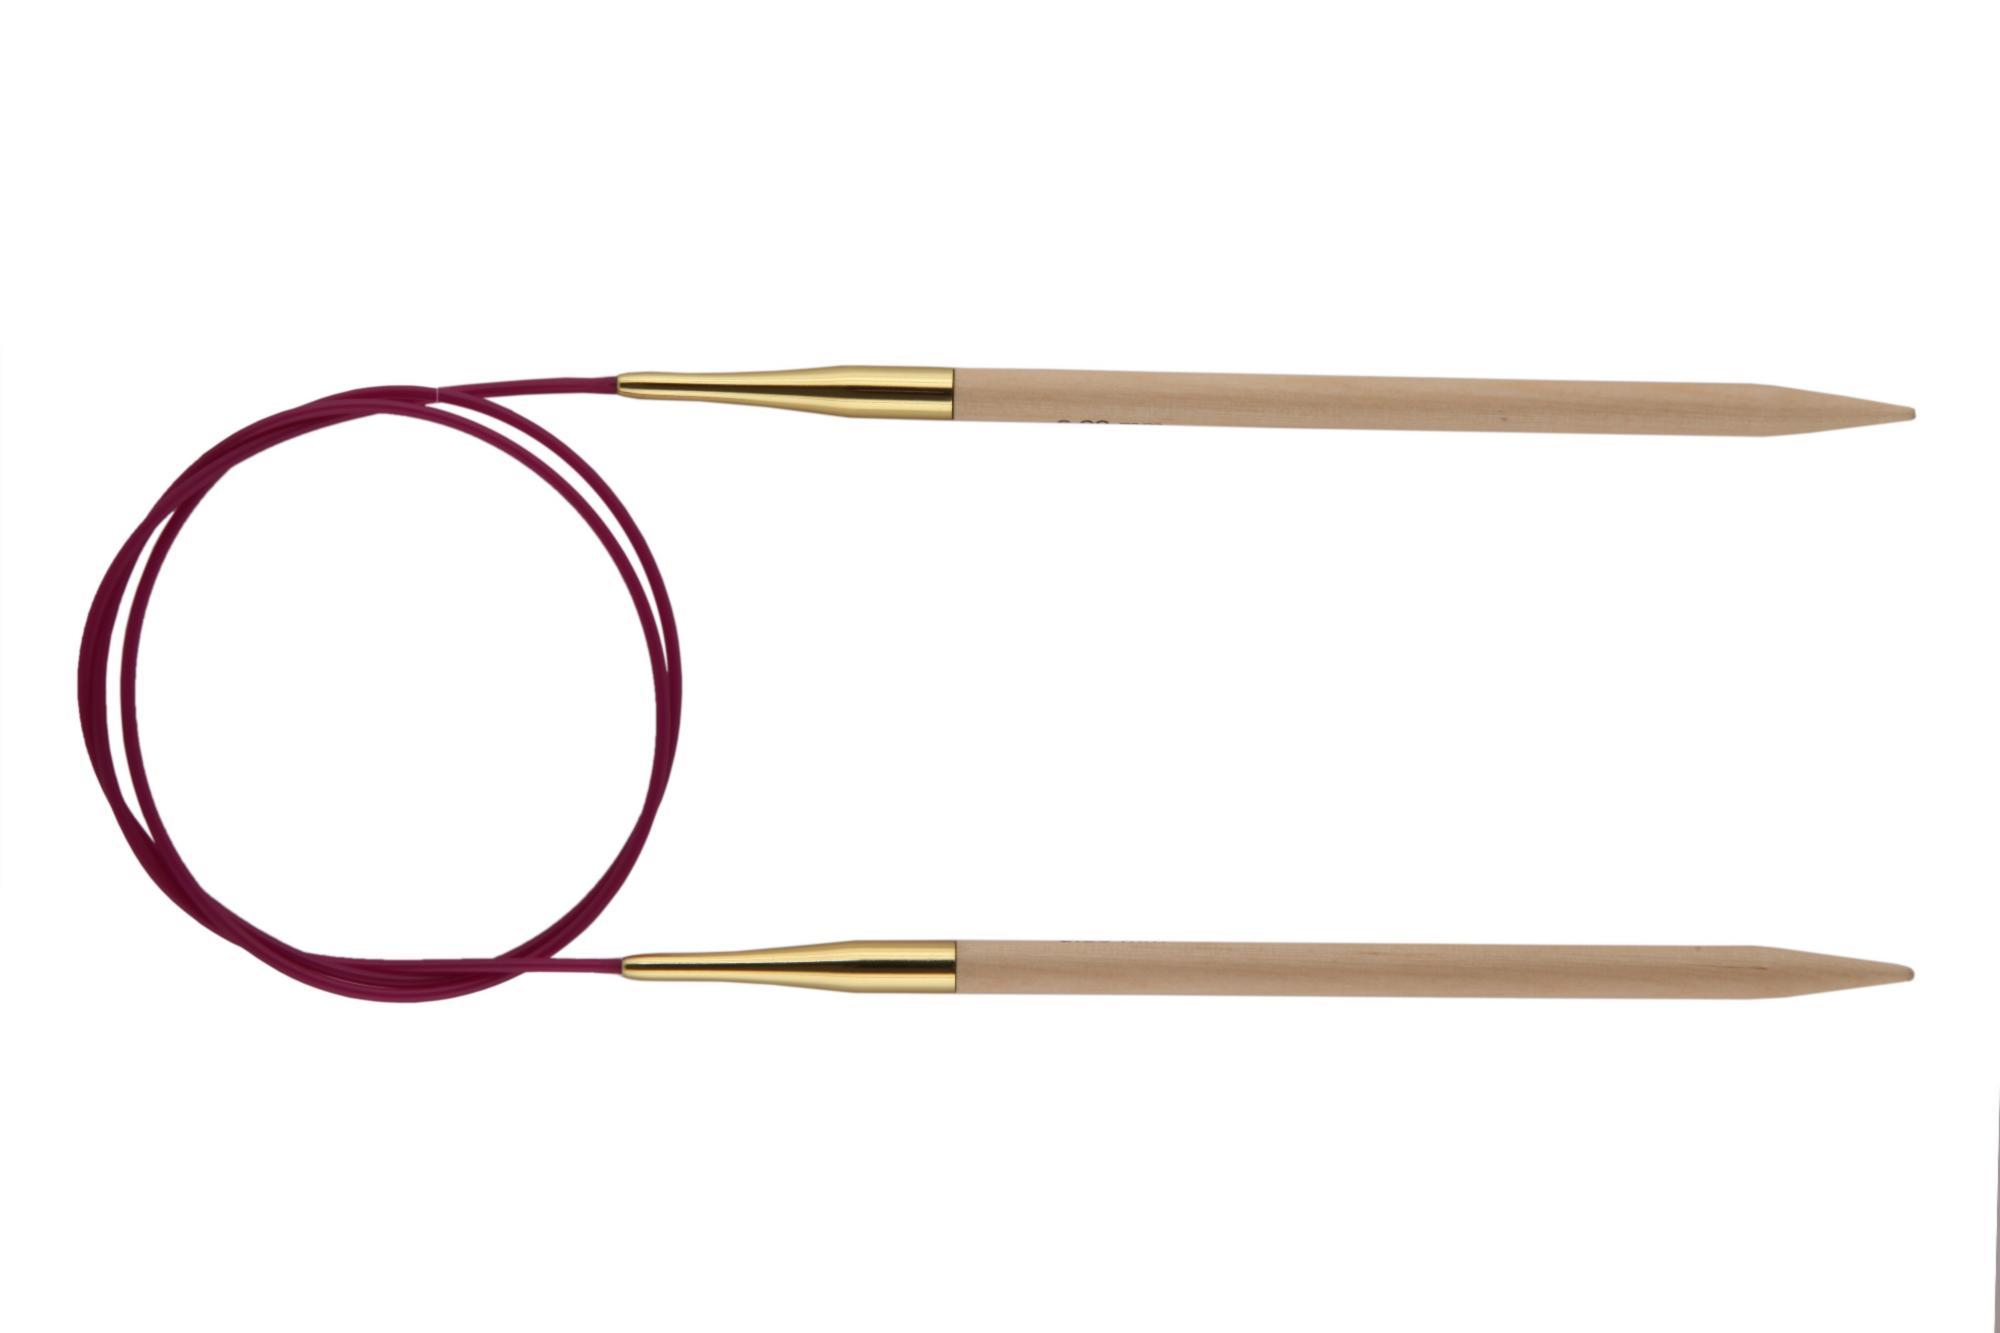 Спицы круговые 100 см Basix Birch Wood KnitPro, 35618, 3.75 мм